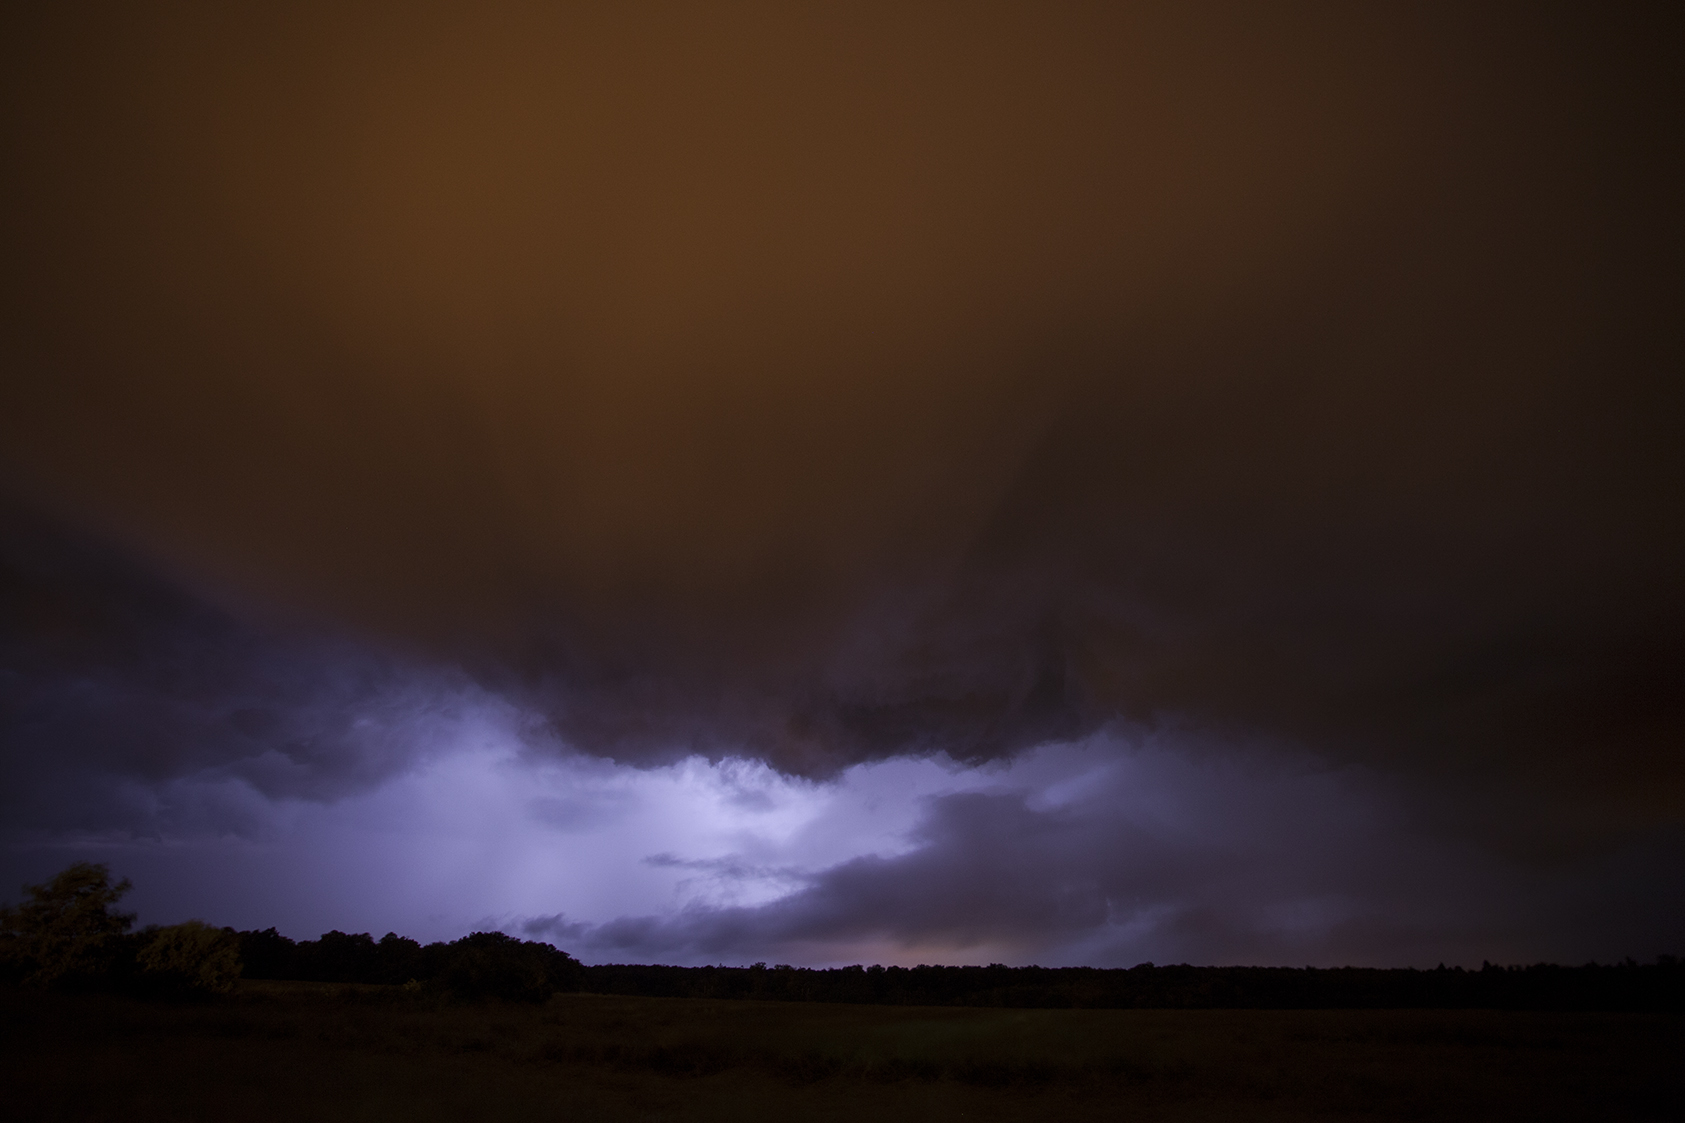 Lightning Storm in Grez-Sur-Loing, Fontainebleau, France